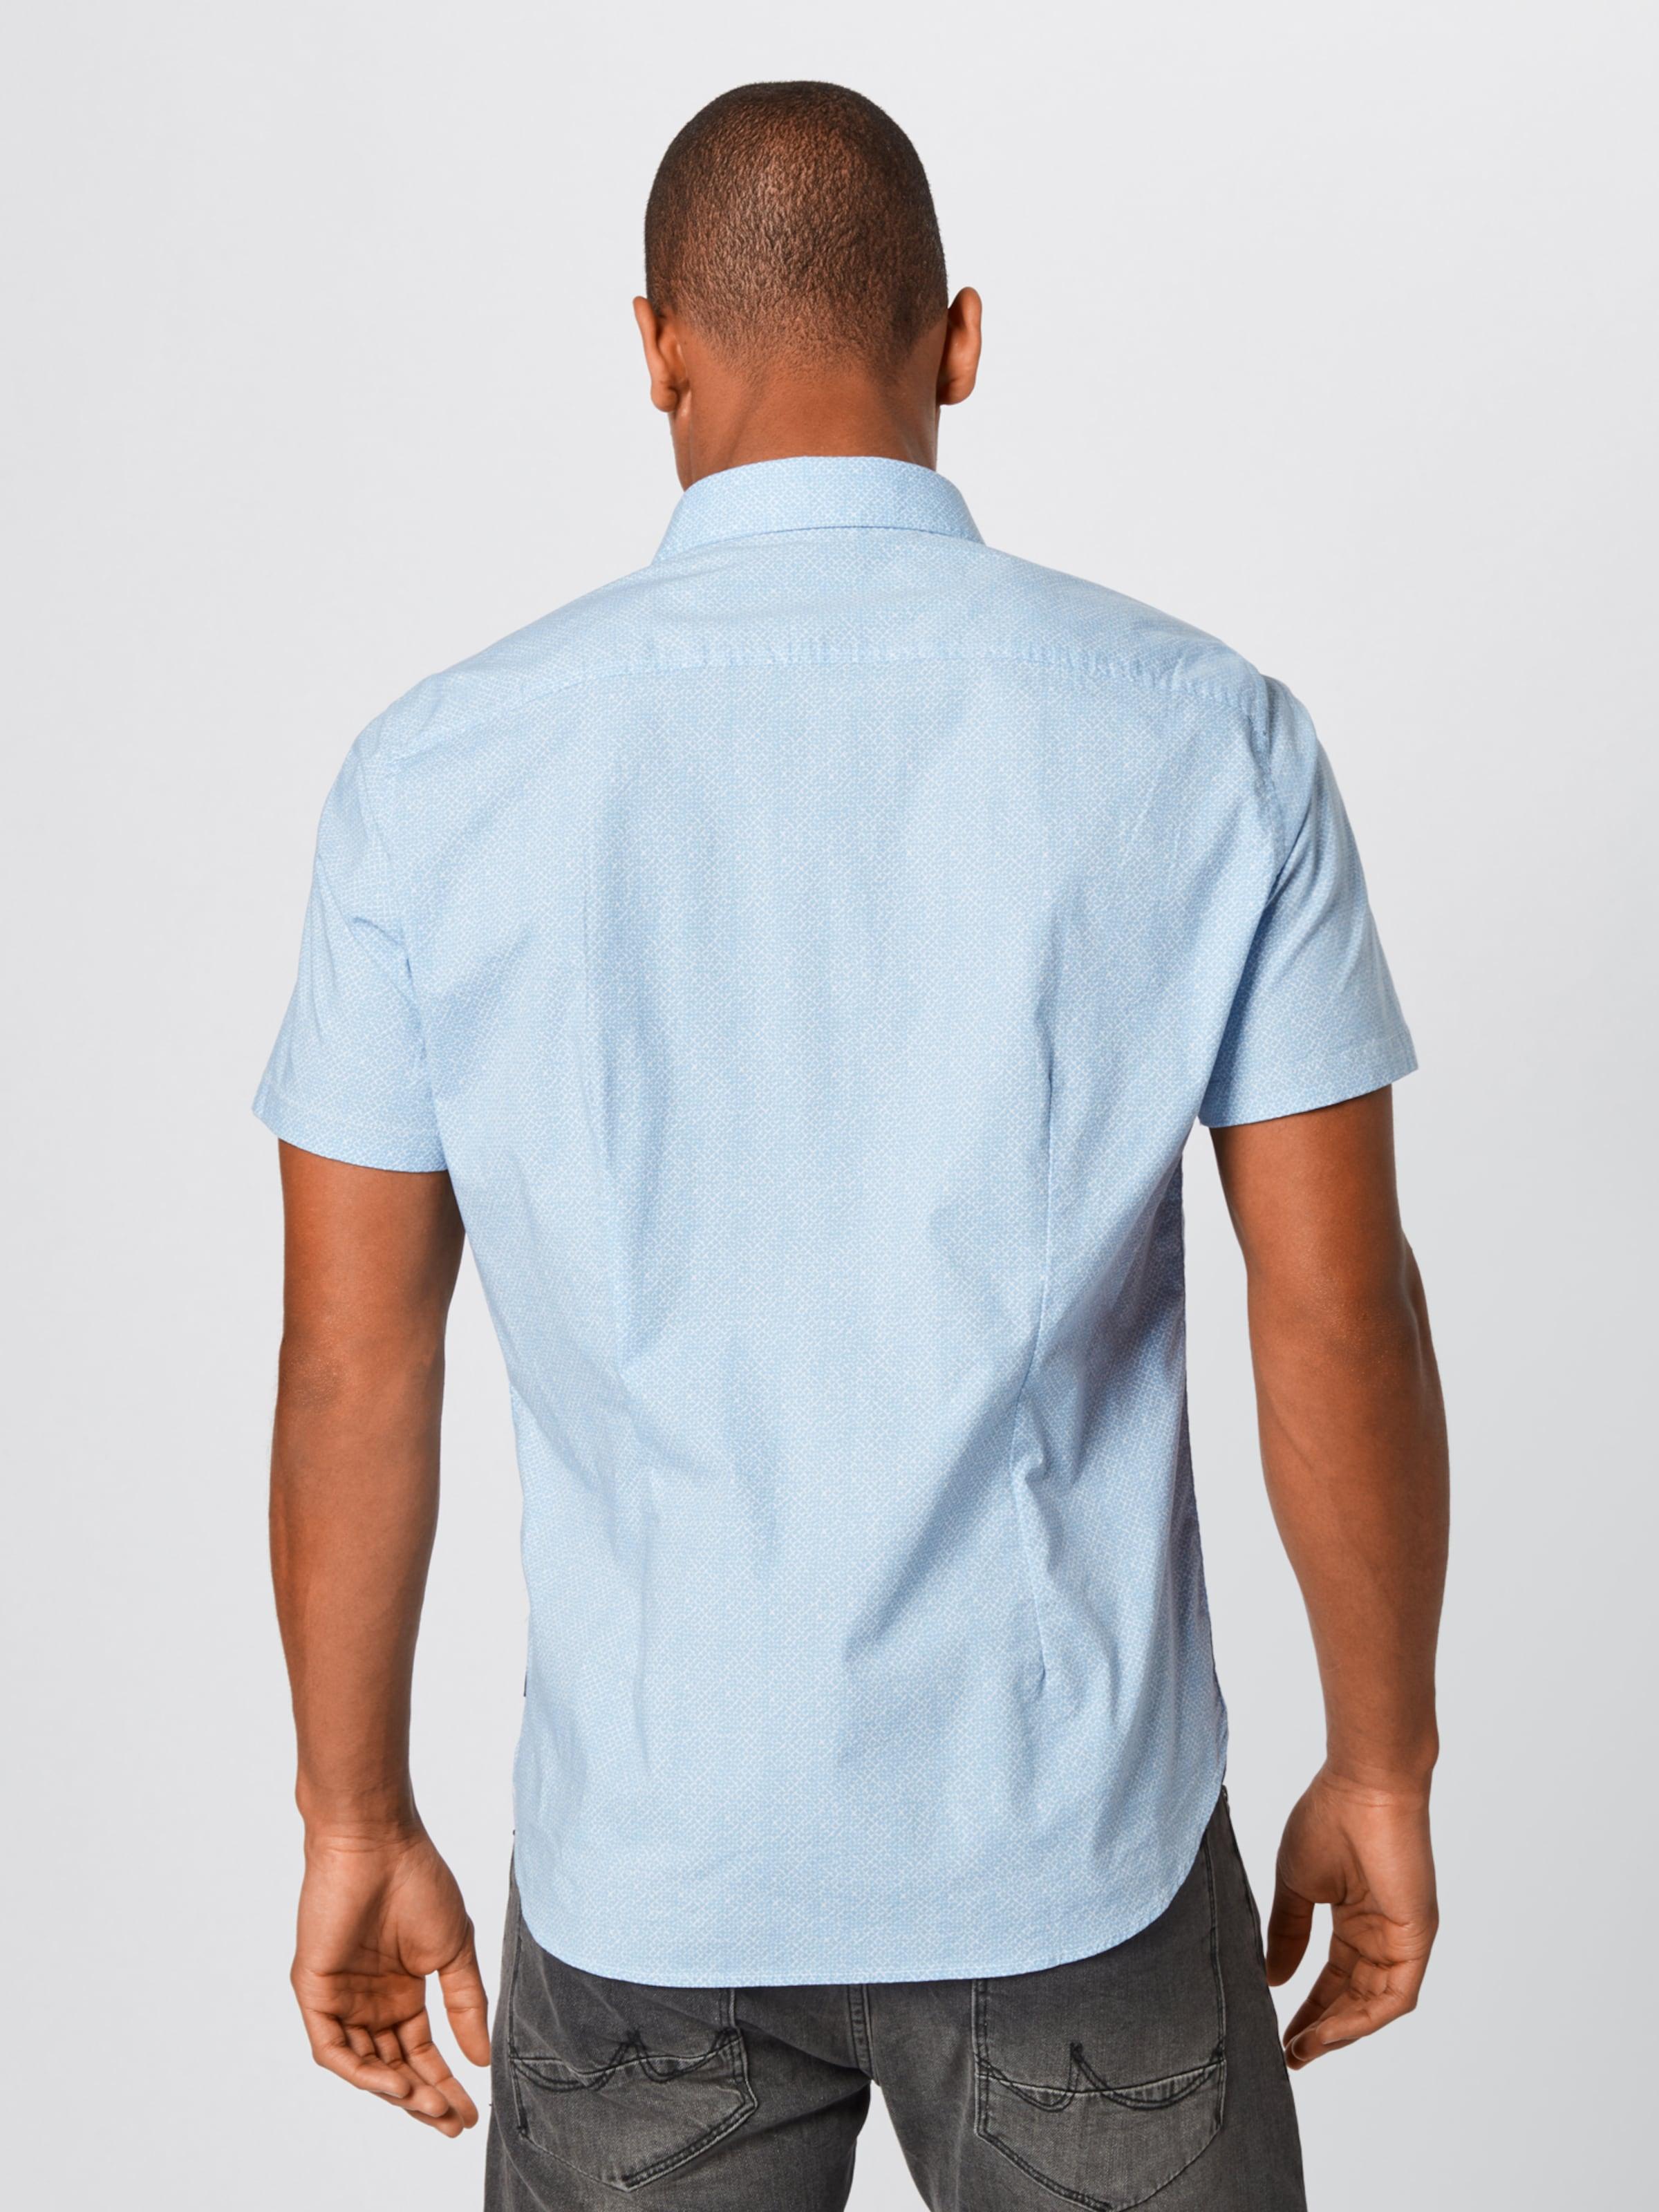 In Hemd S oliver Red Blau Label I9EDH2